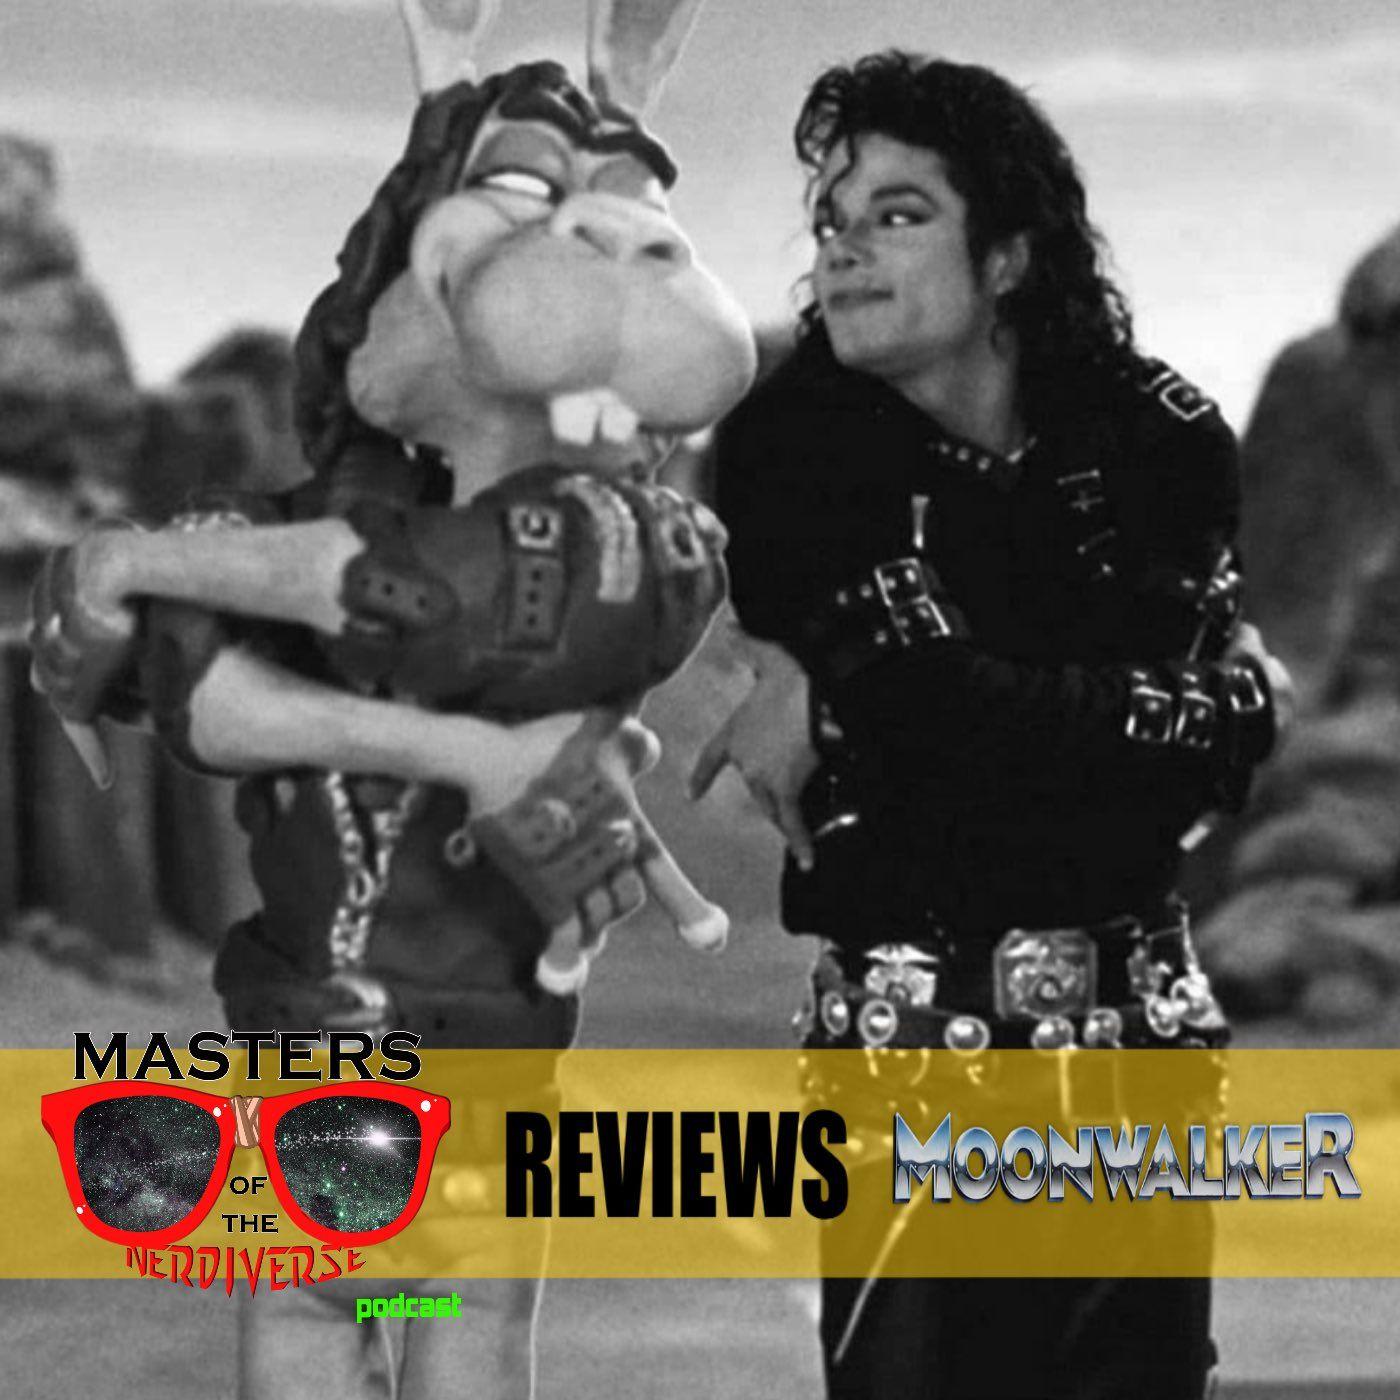 MOTN Reviews: Michael Jackson's Moonwalker (1988)